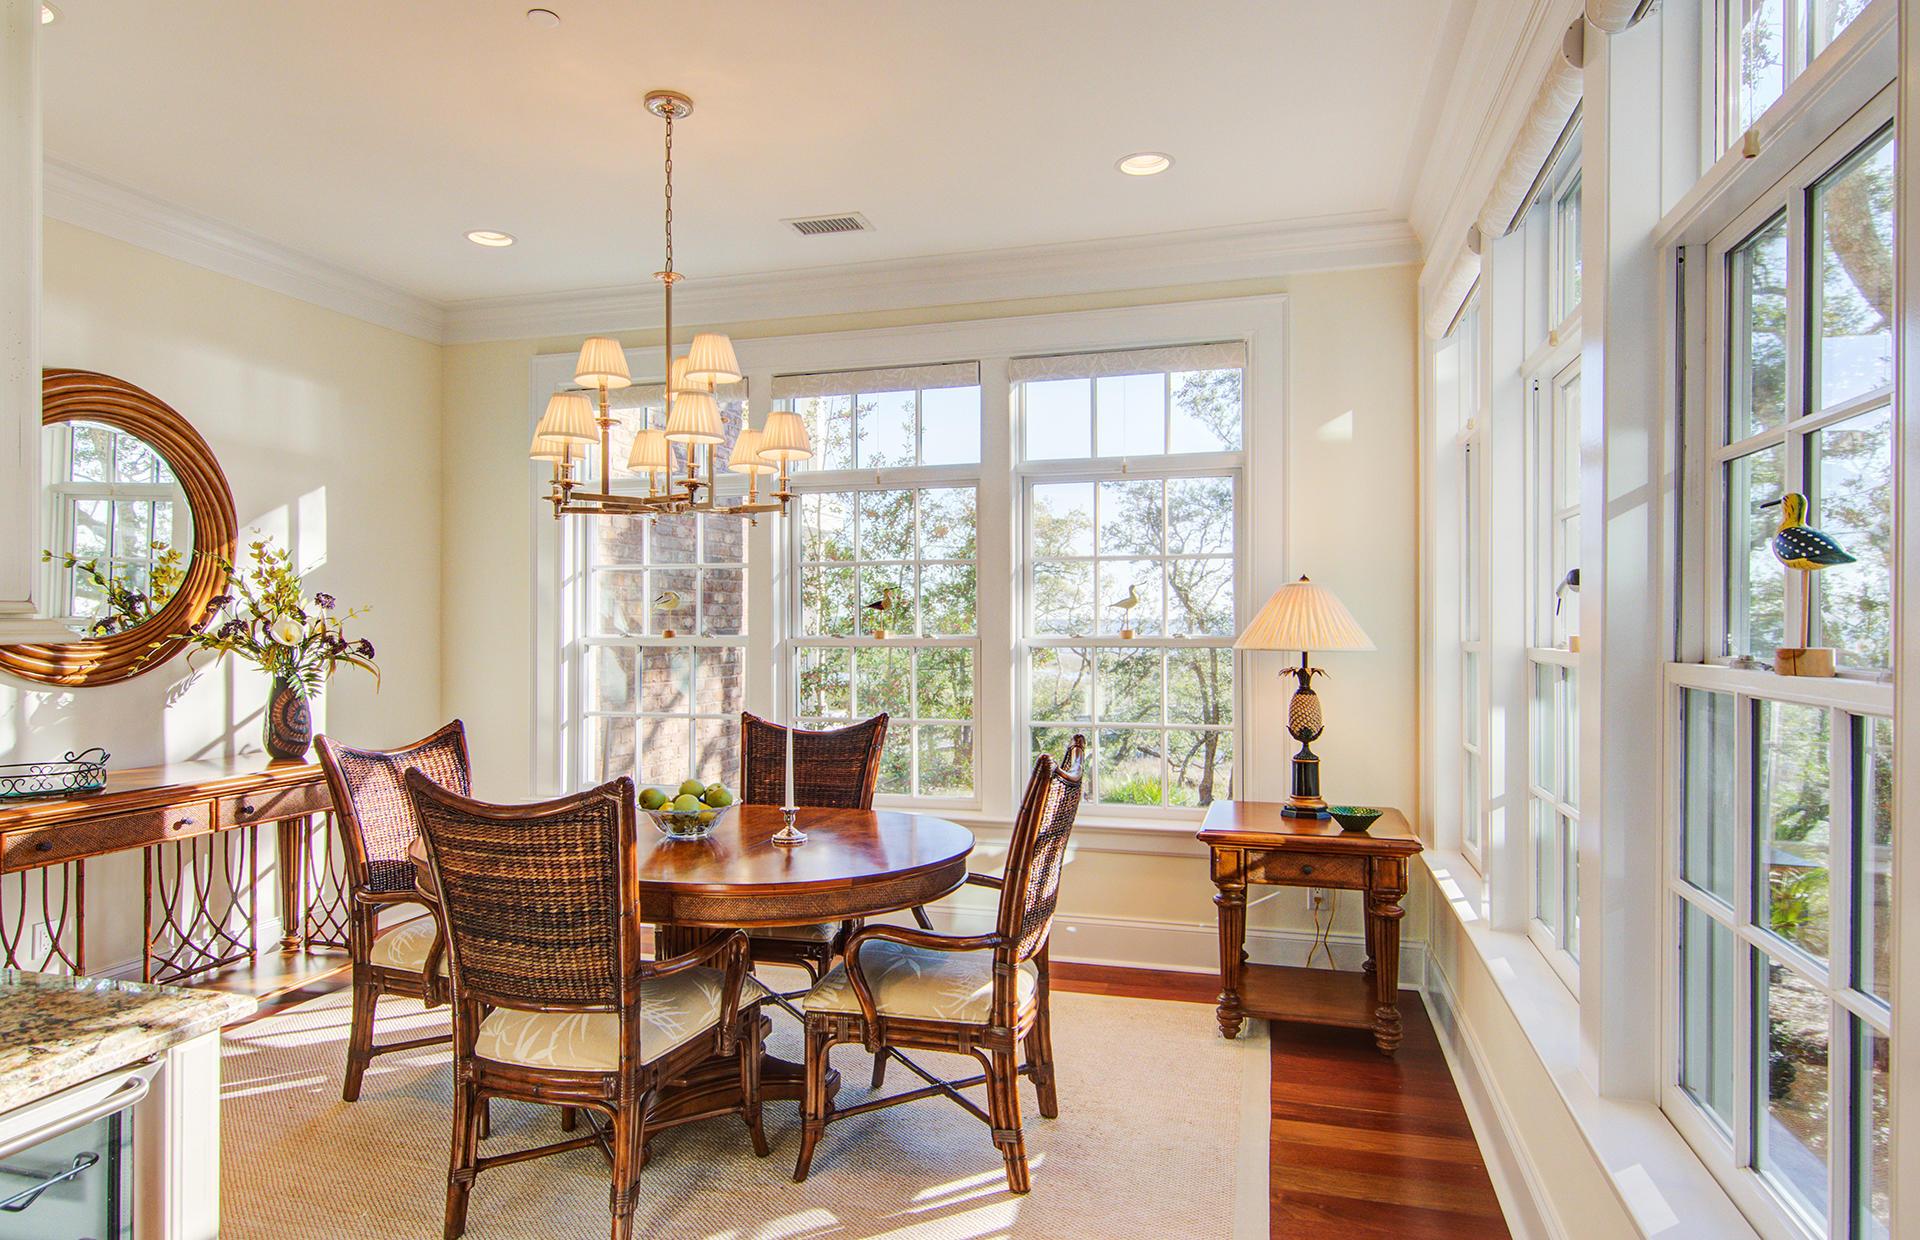 Daniel Island Homes For Sale - 134 Fairbanks Oak, Charleston, SC - 36